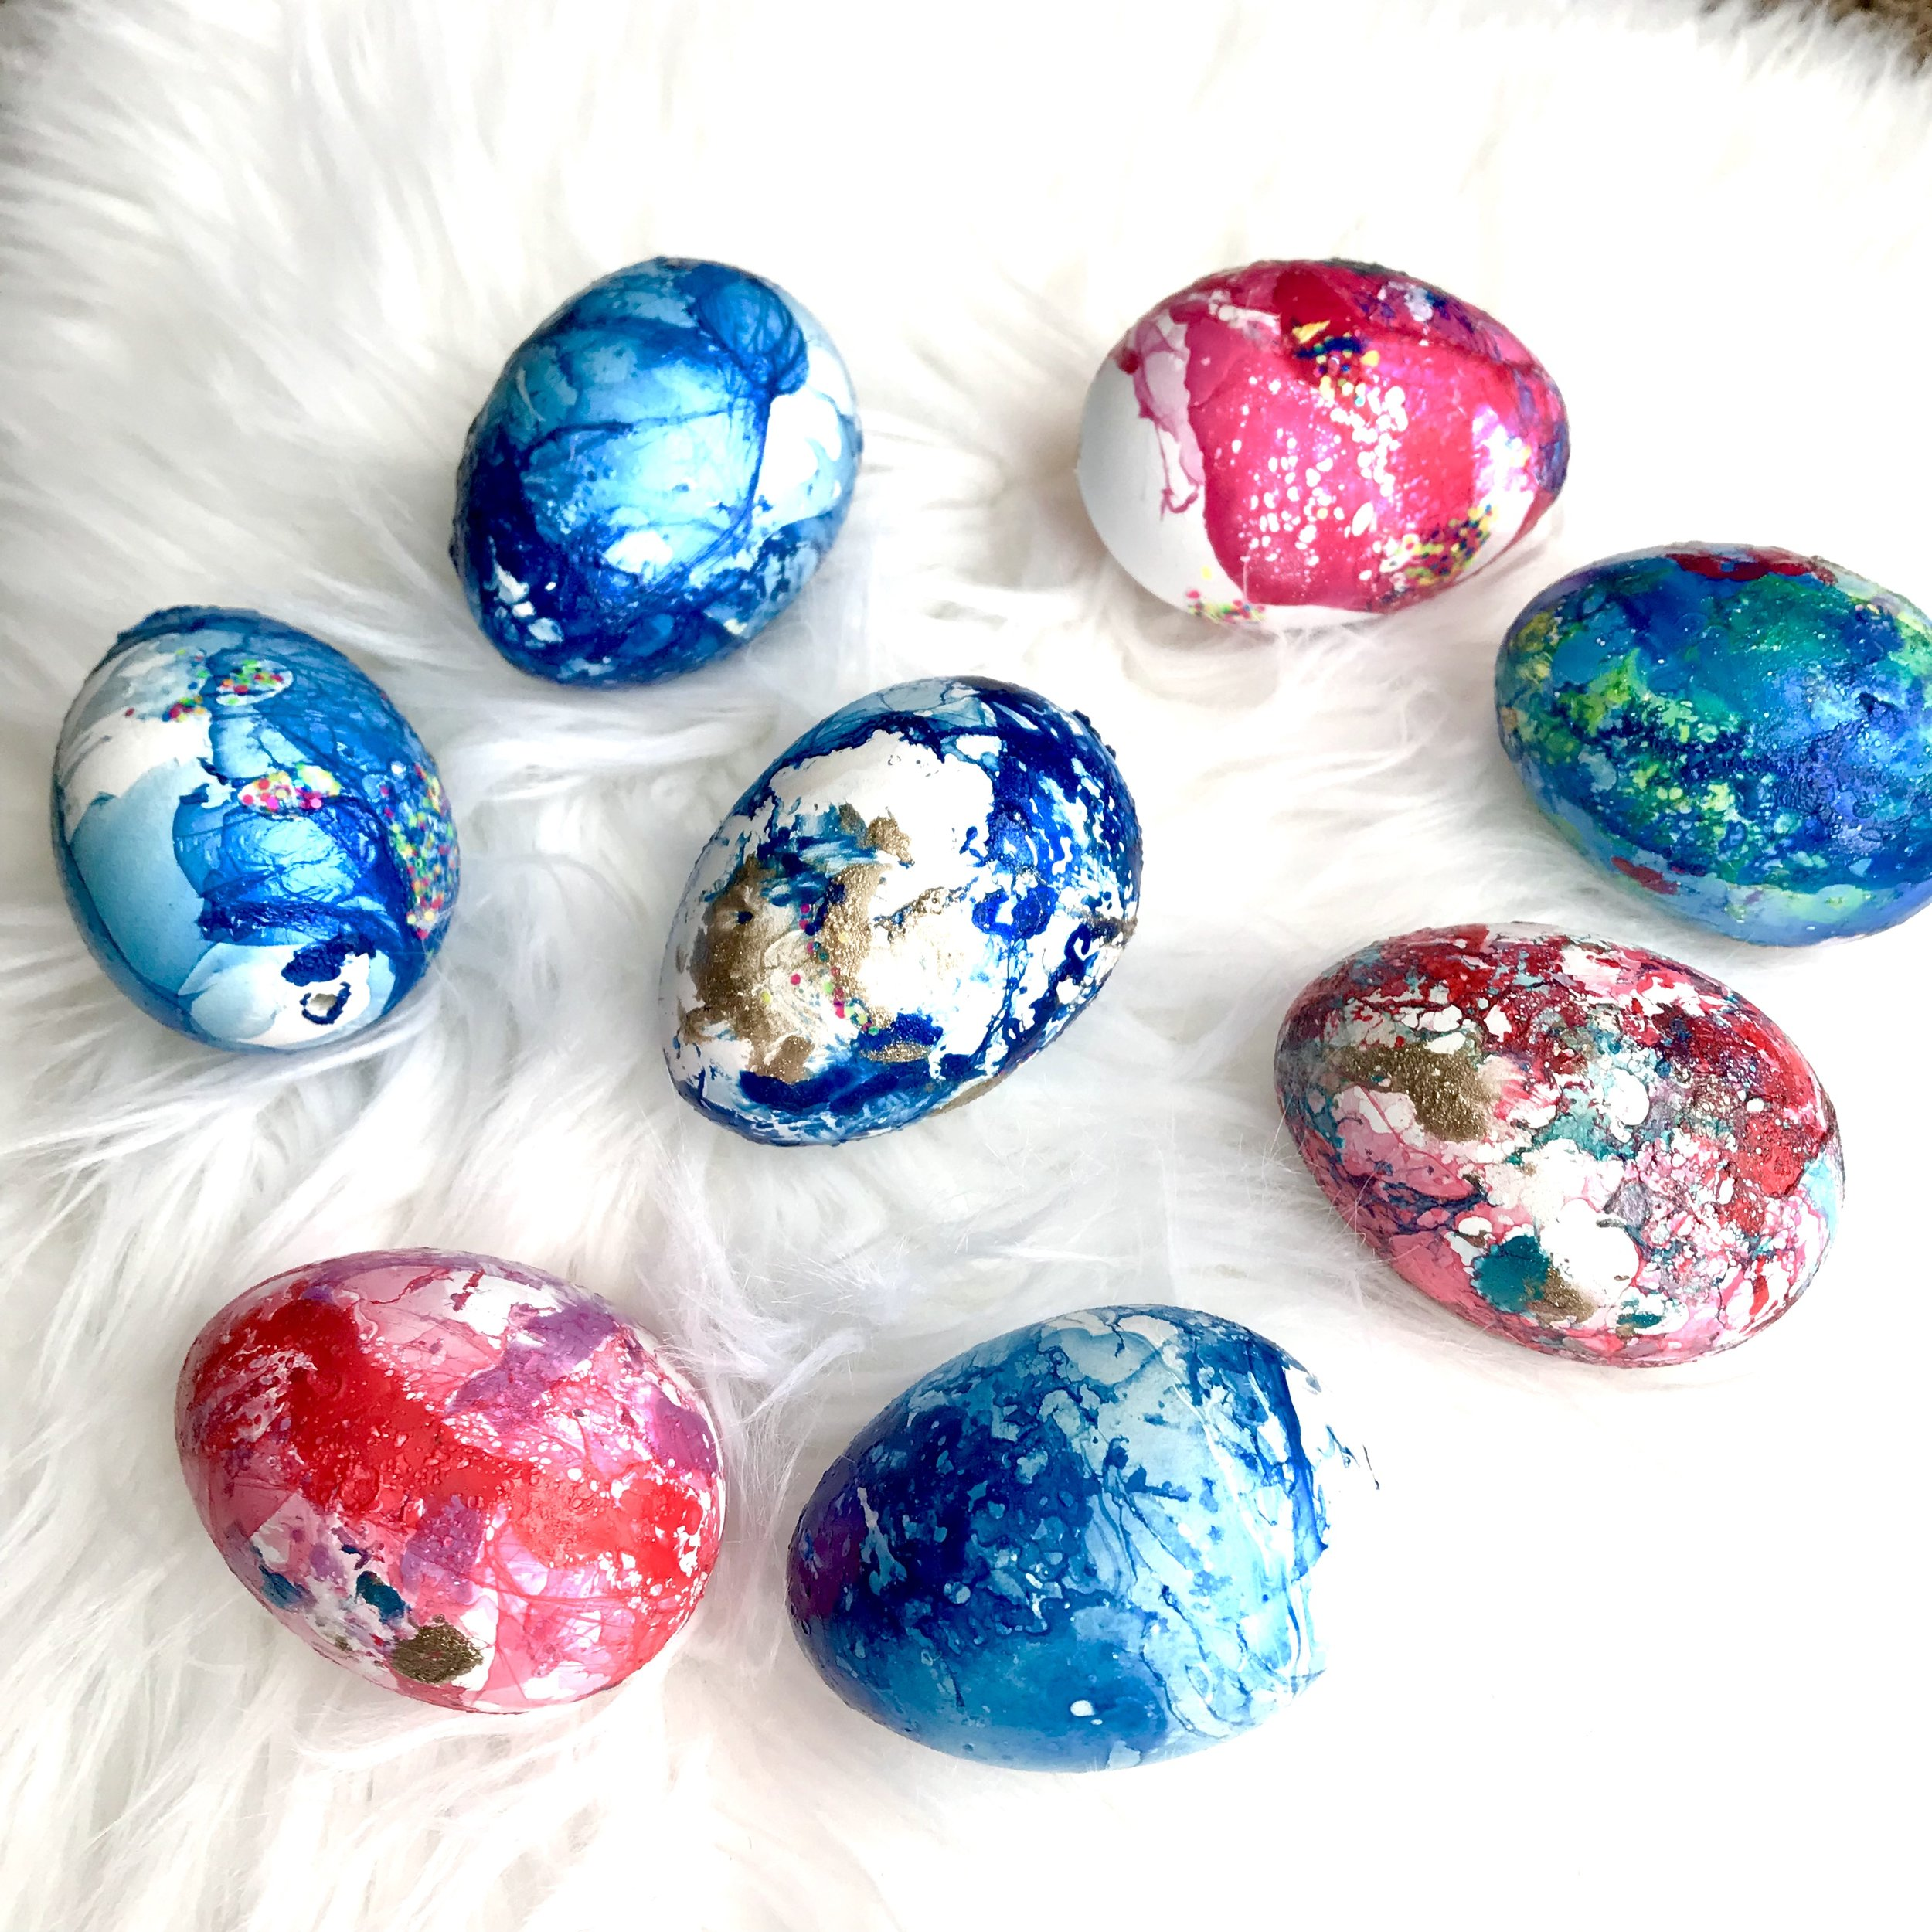 nail_polish_eggs.jpg